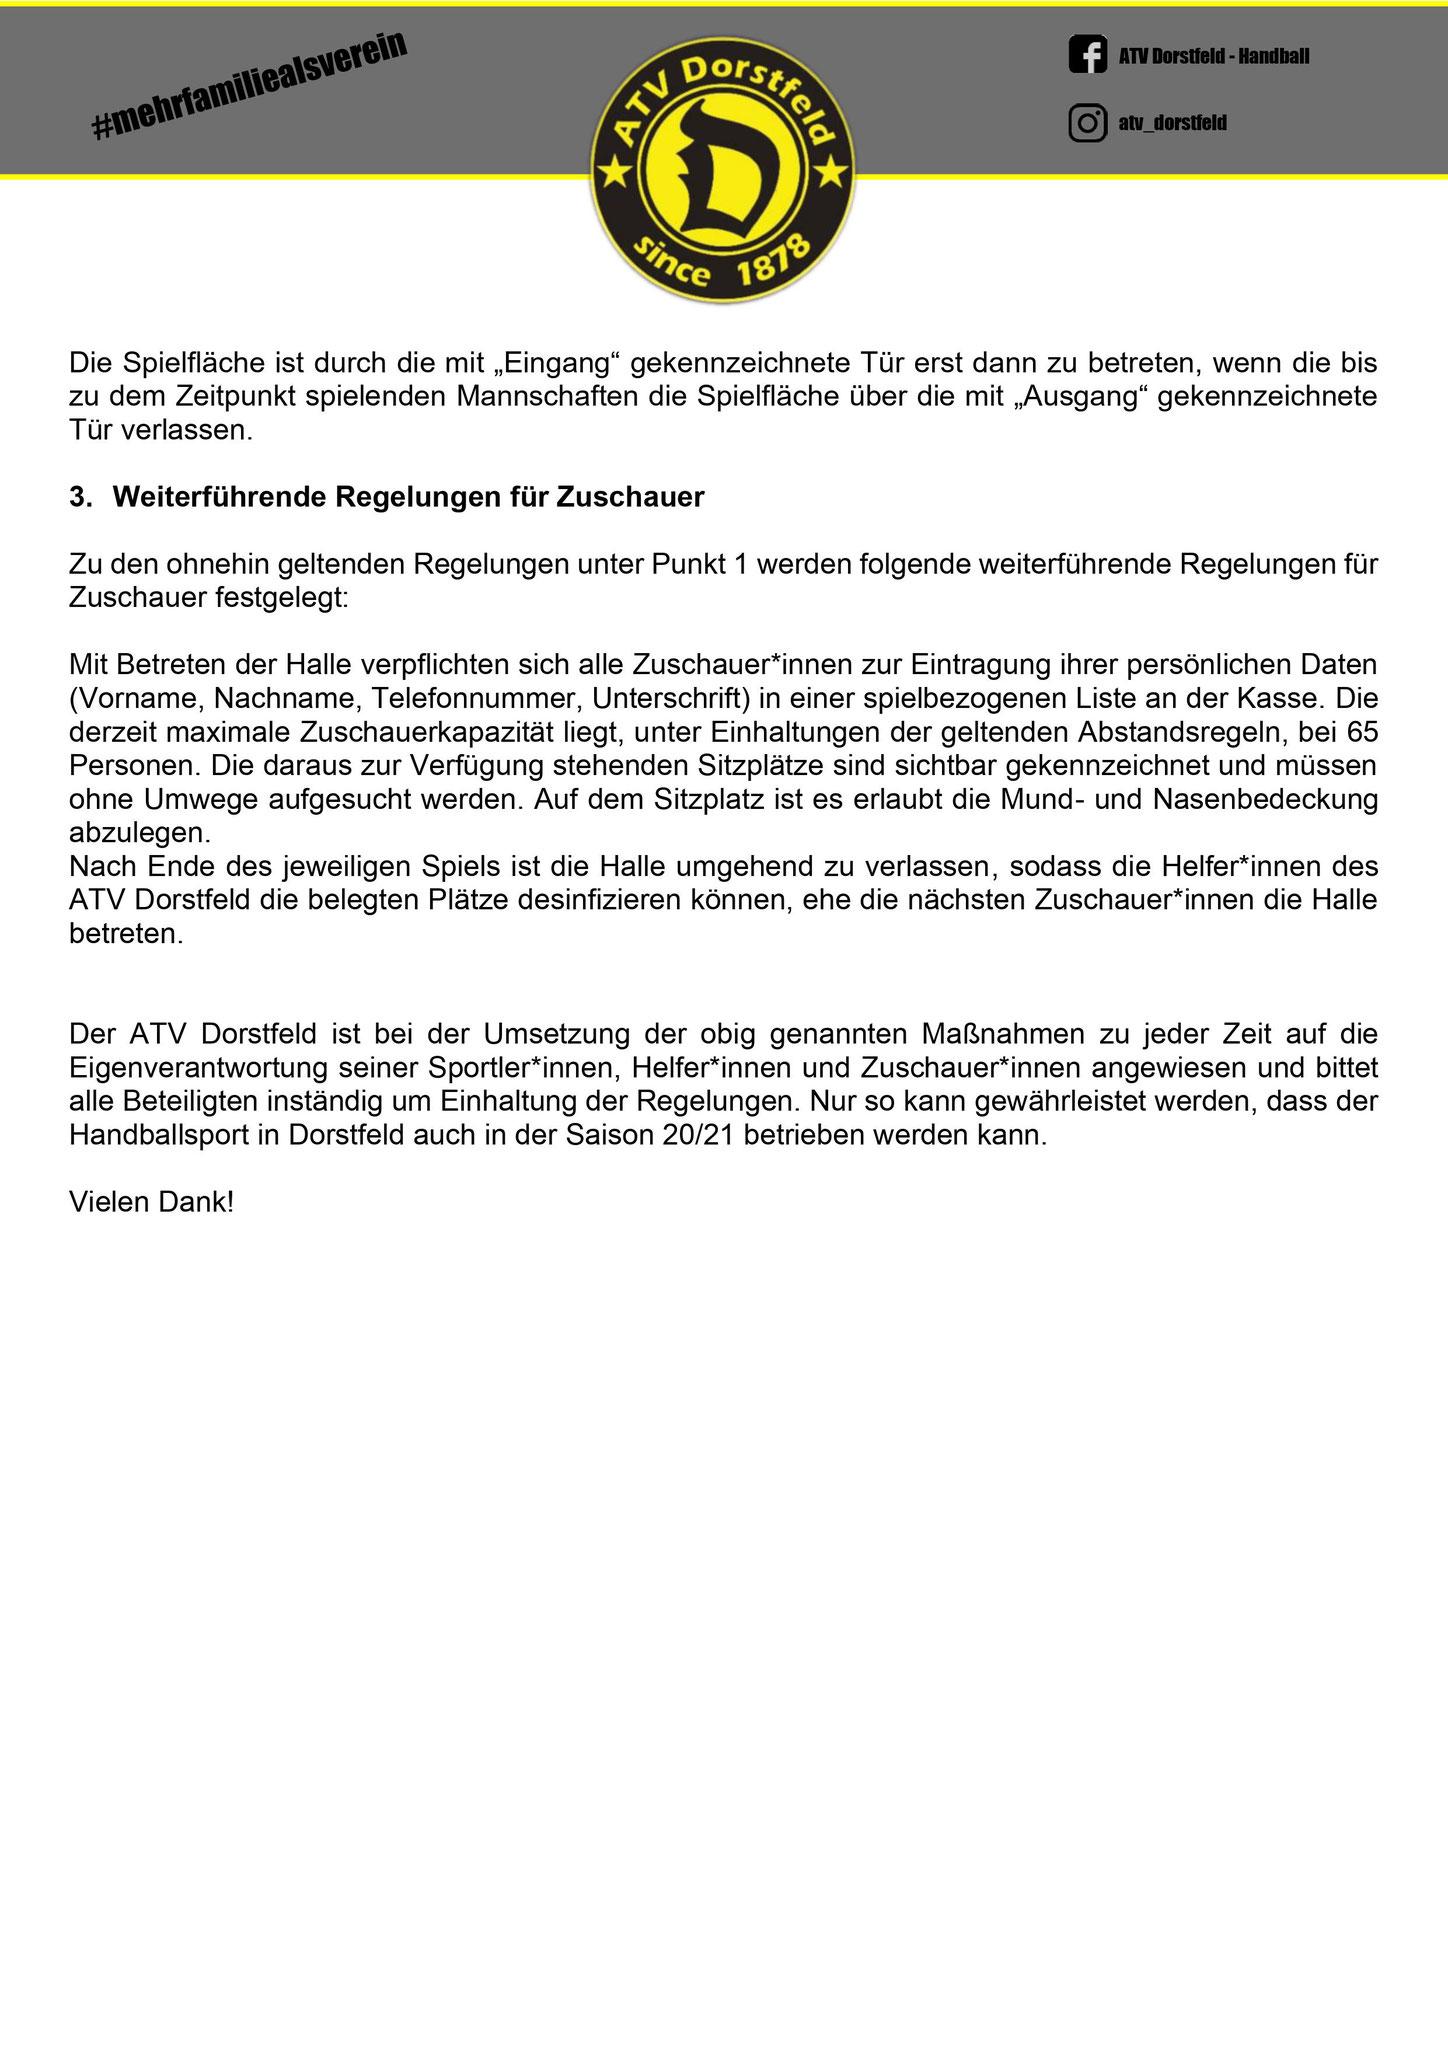 Seite 2 - Hygienekonzept des ATV Dorstfeld